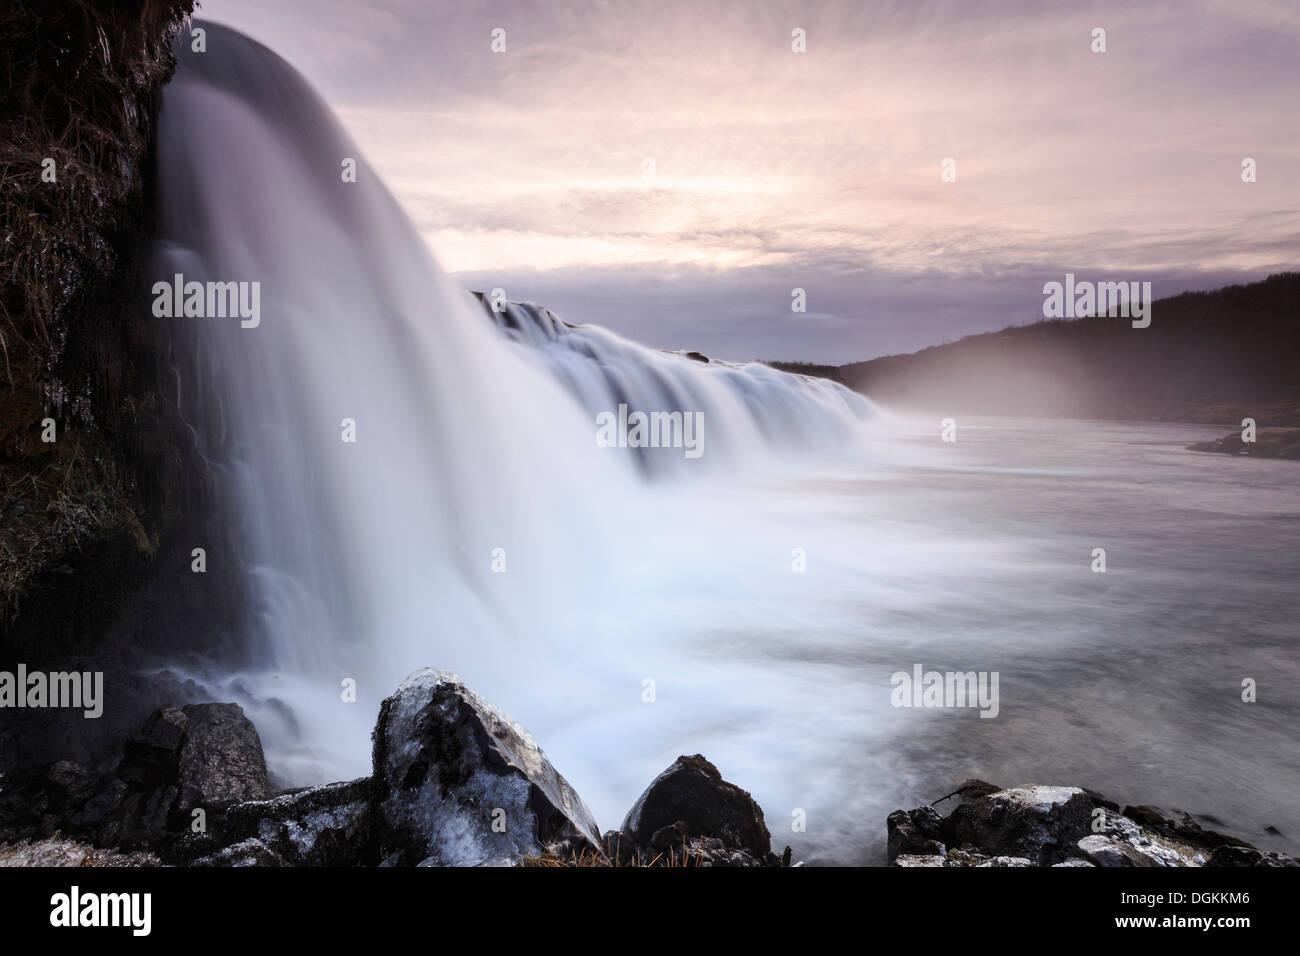 Ein Blick auf den Faxifoss-Wasserfall im Süden Islands. Stockbild